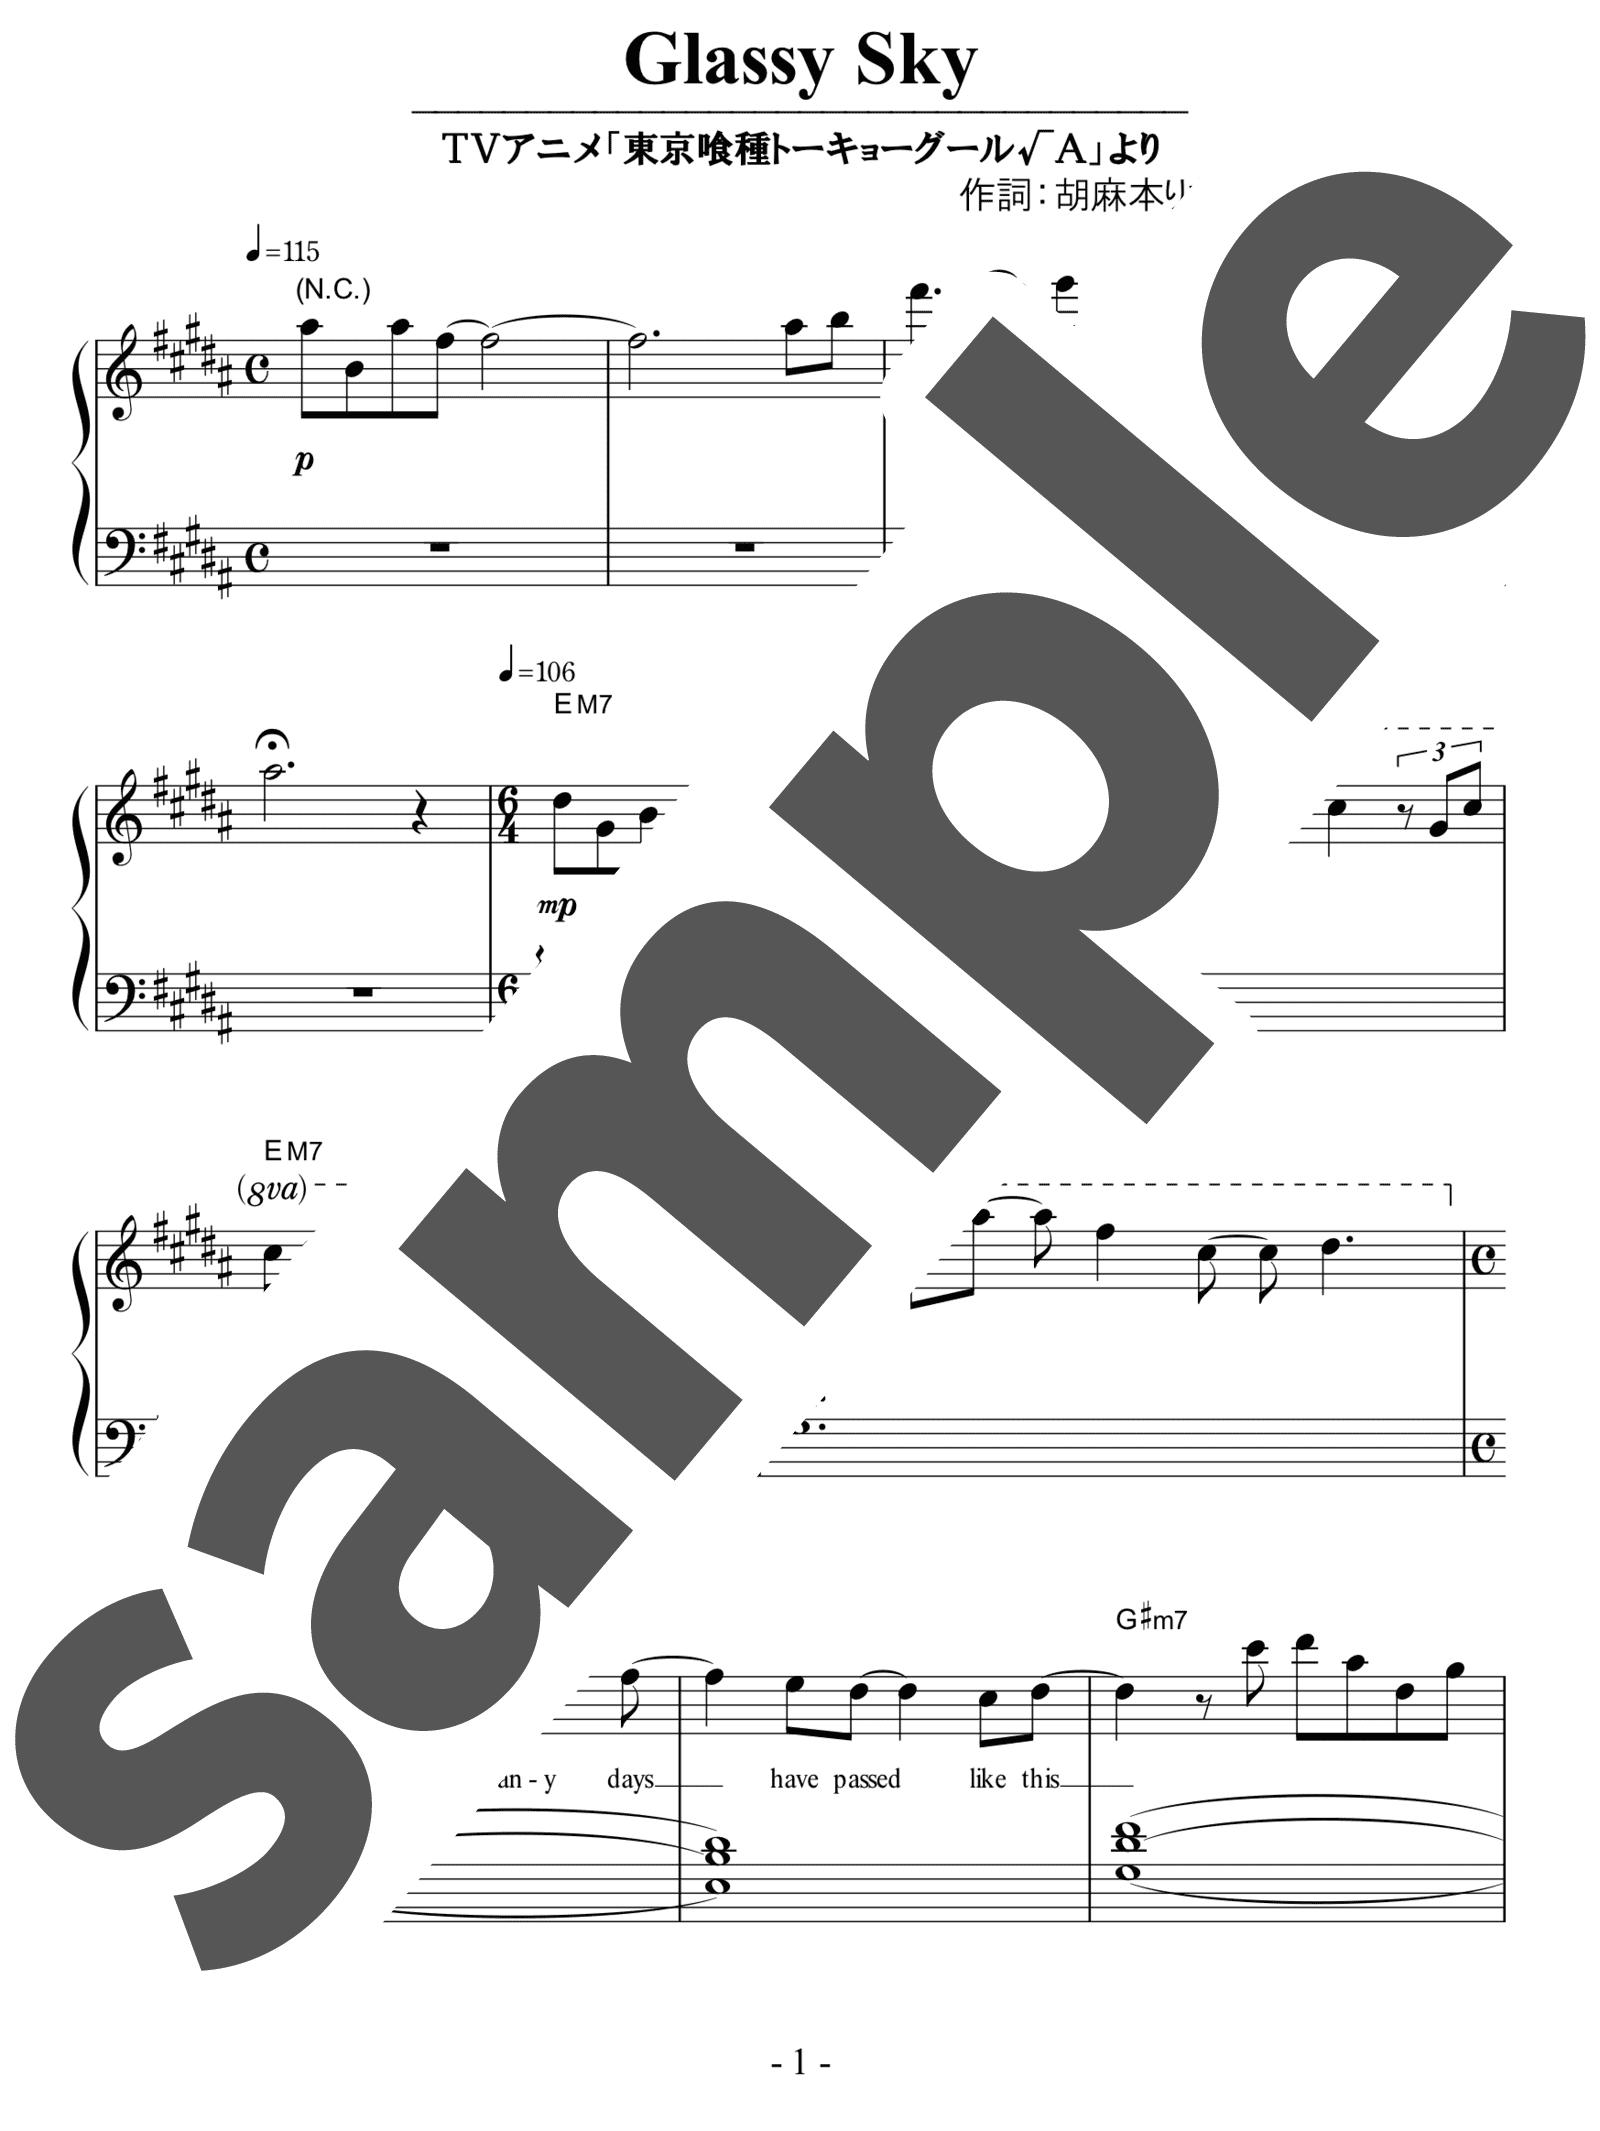 「GLASSY SKY」のサンプル楽譜